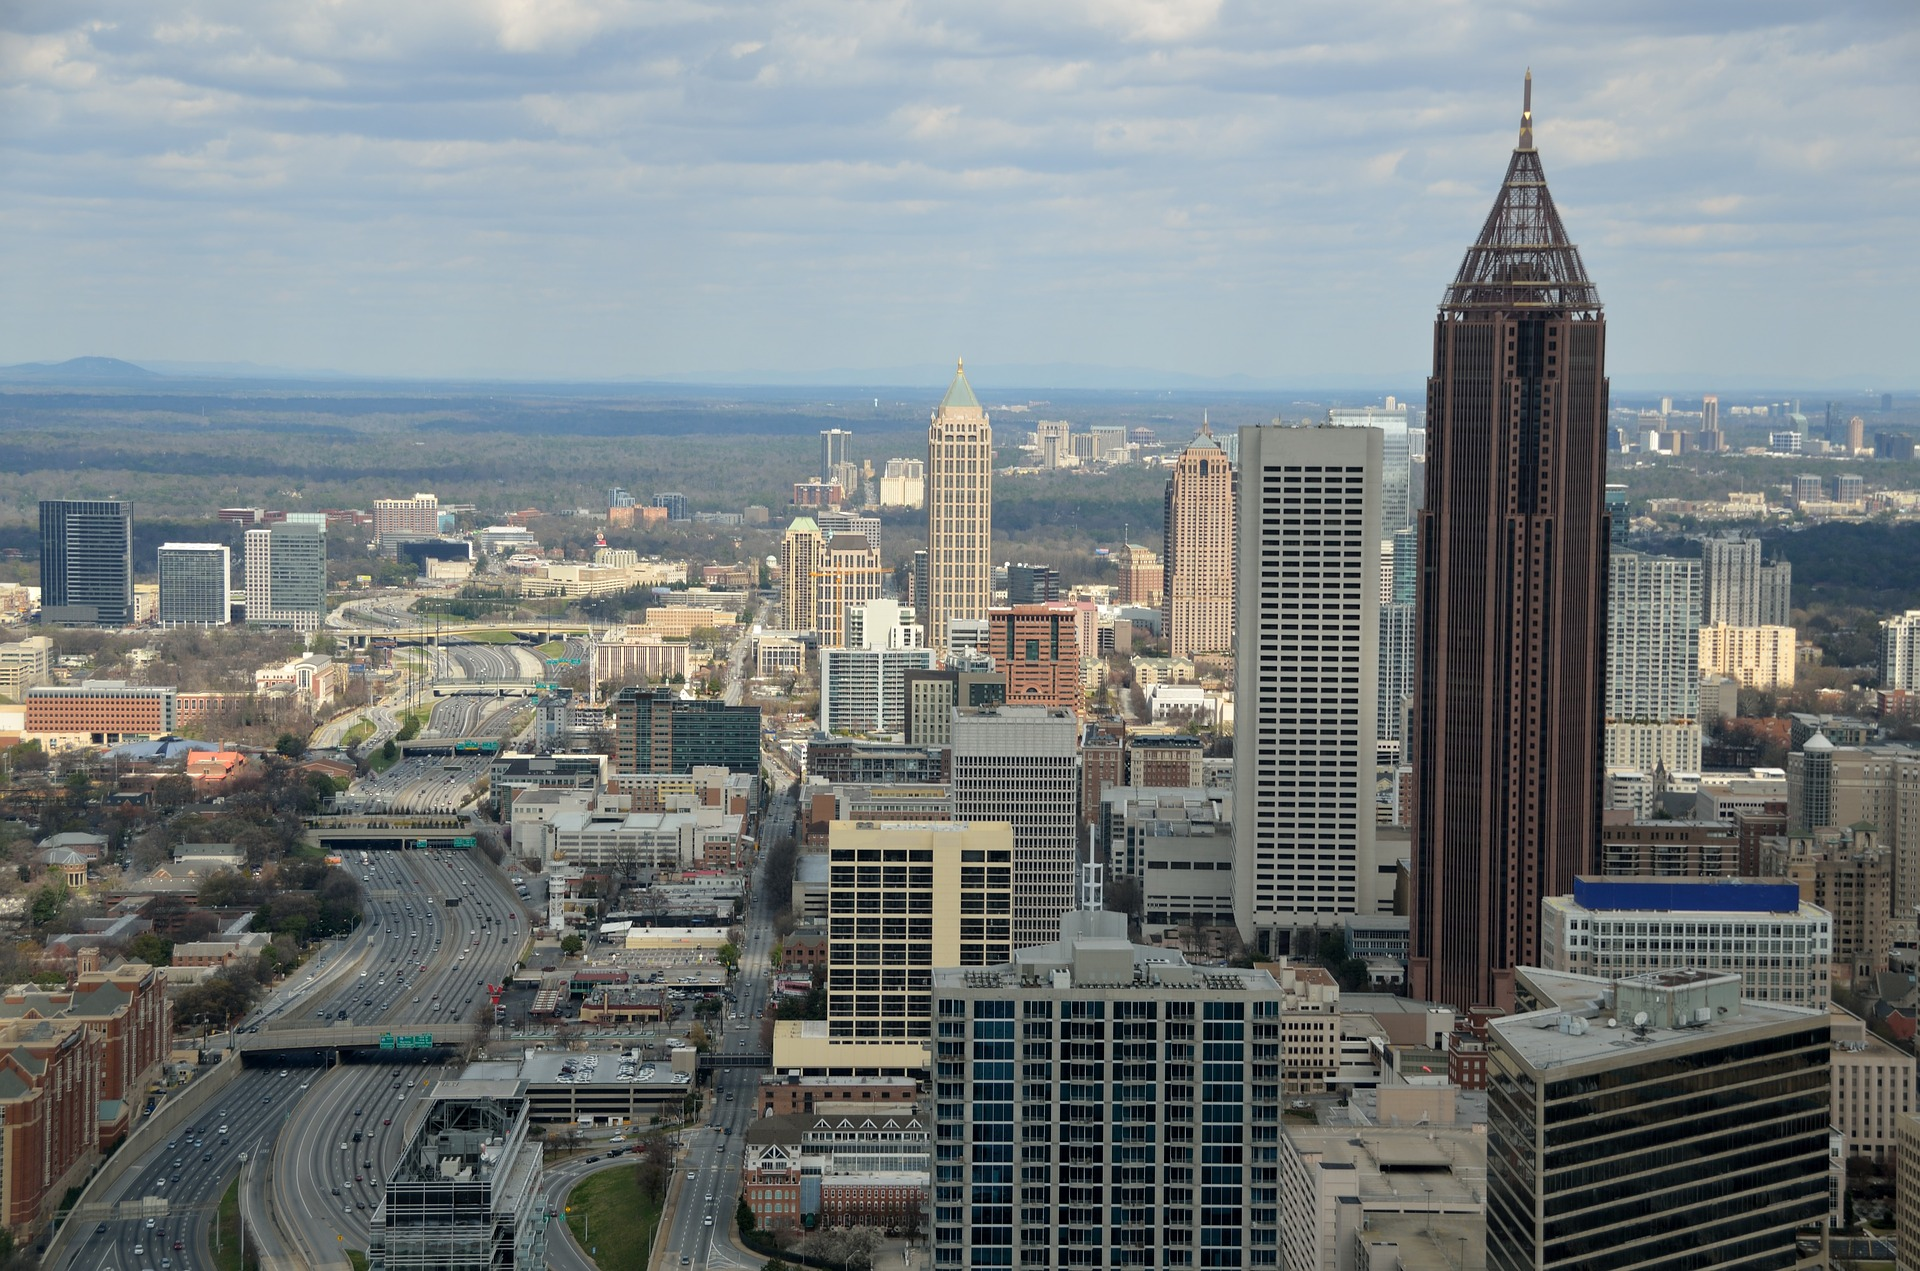 Les_quartiers_les_plus_branchés_d_Atlanta